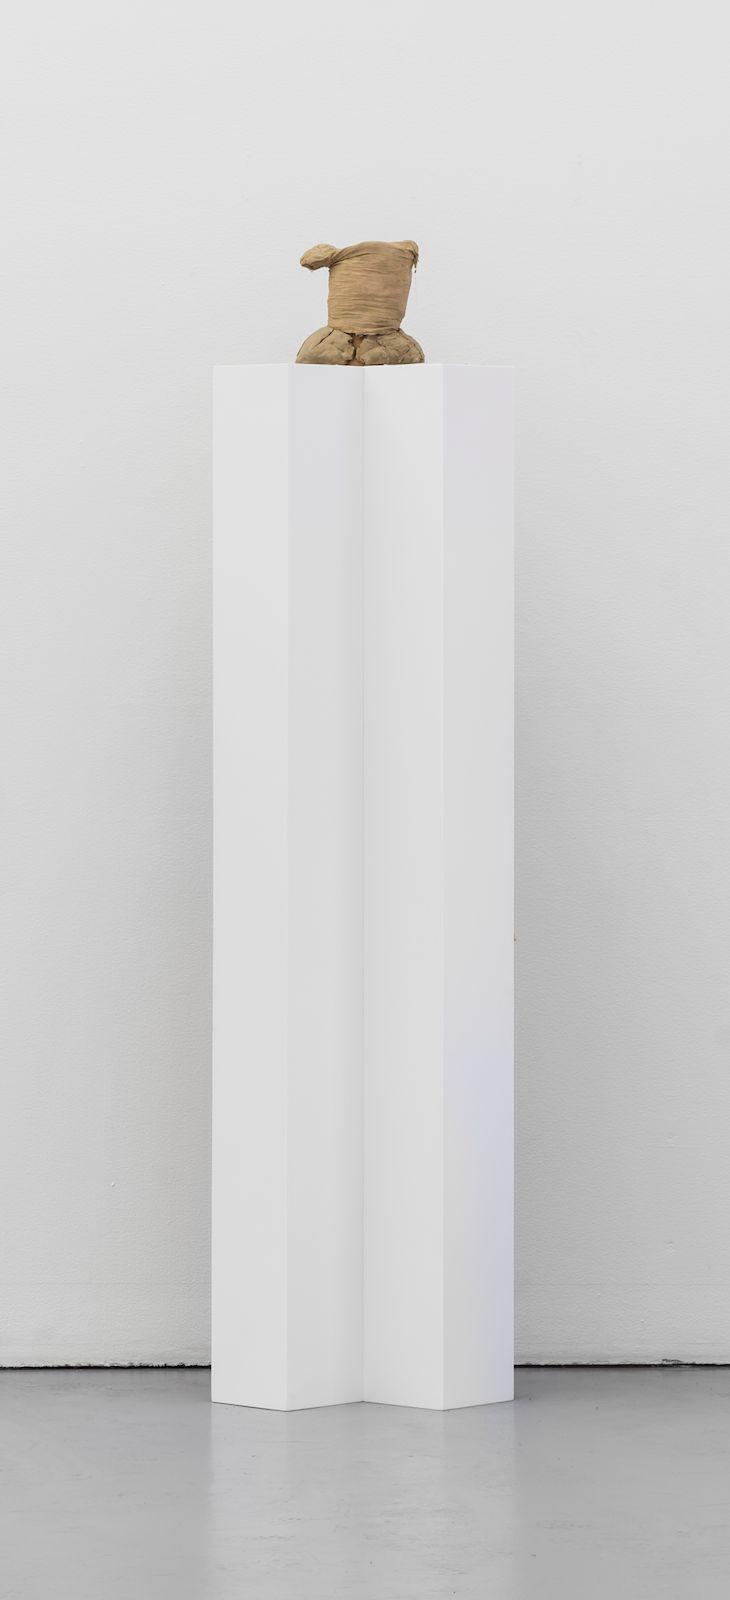 Facade shelf, 2015, composite material, steel, mixed media, 204 x 53 x 41 cm